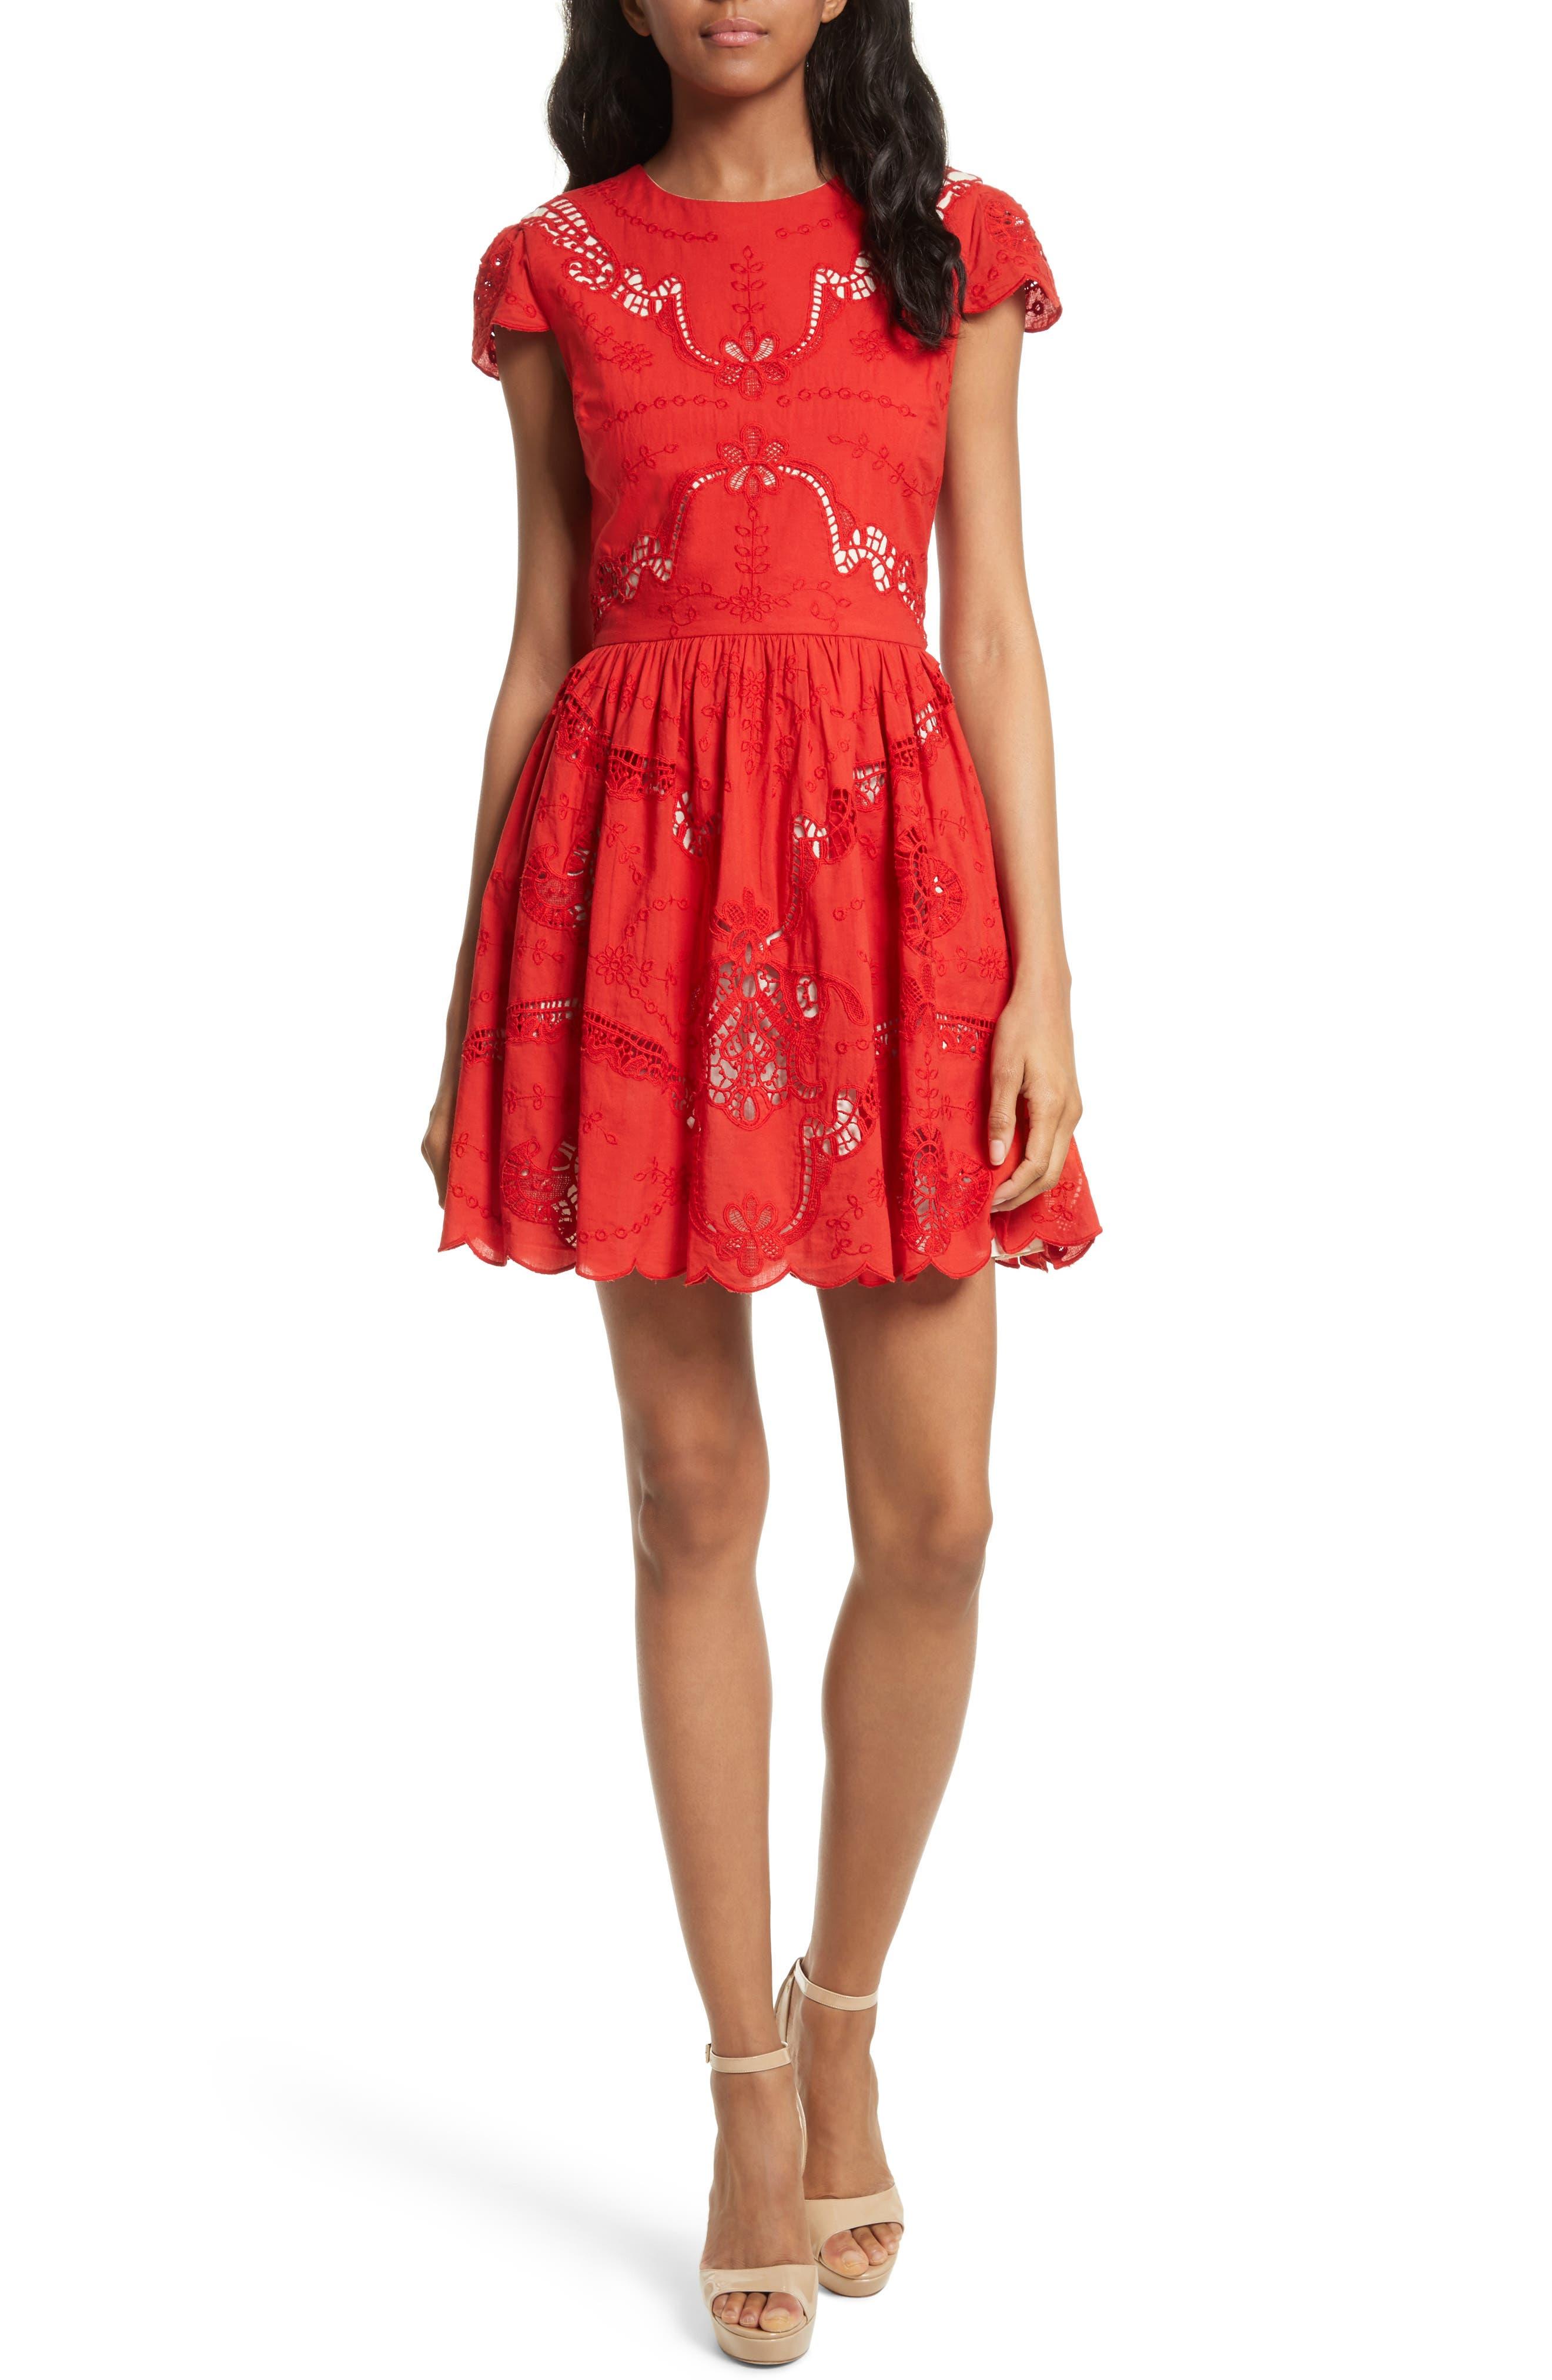 Alternate Image 1 Selected - Alice + Olivia Karen Eyelet Embroidered Party Dress